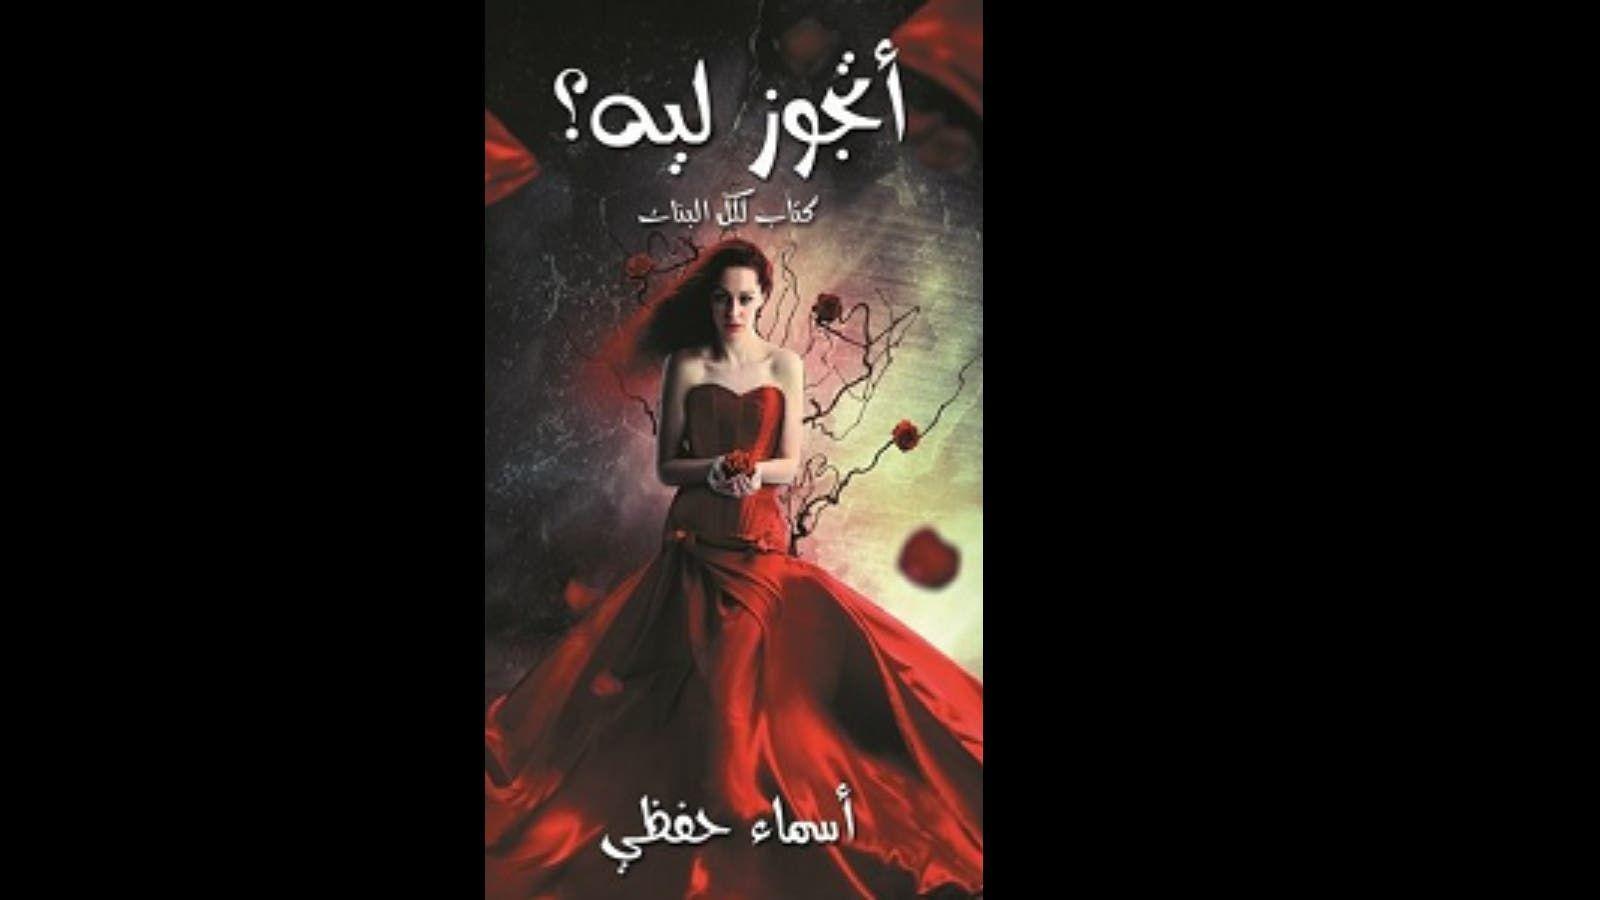 أتجوز ليه كتاب لكل البنات تأليف أسماء حفظي Book Cover Poster Movie Posters